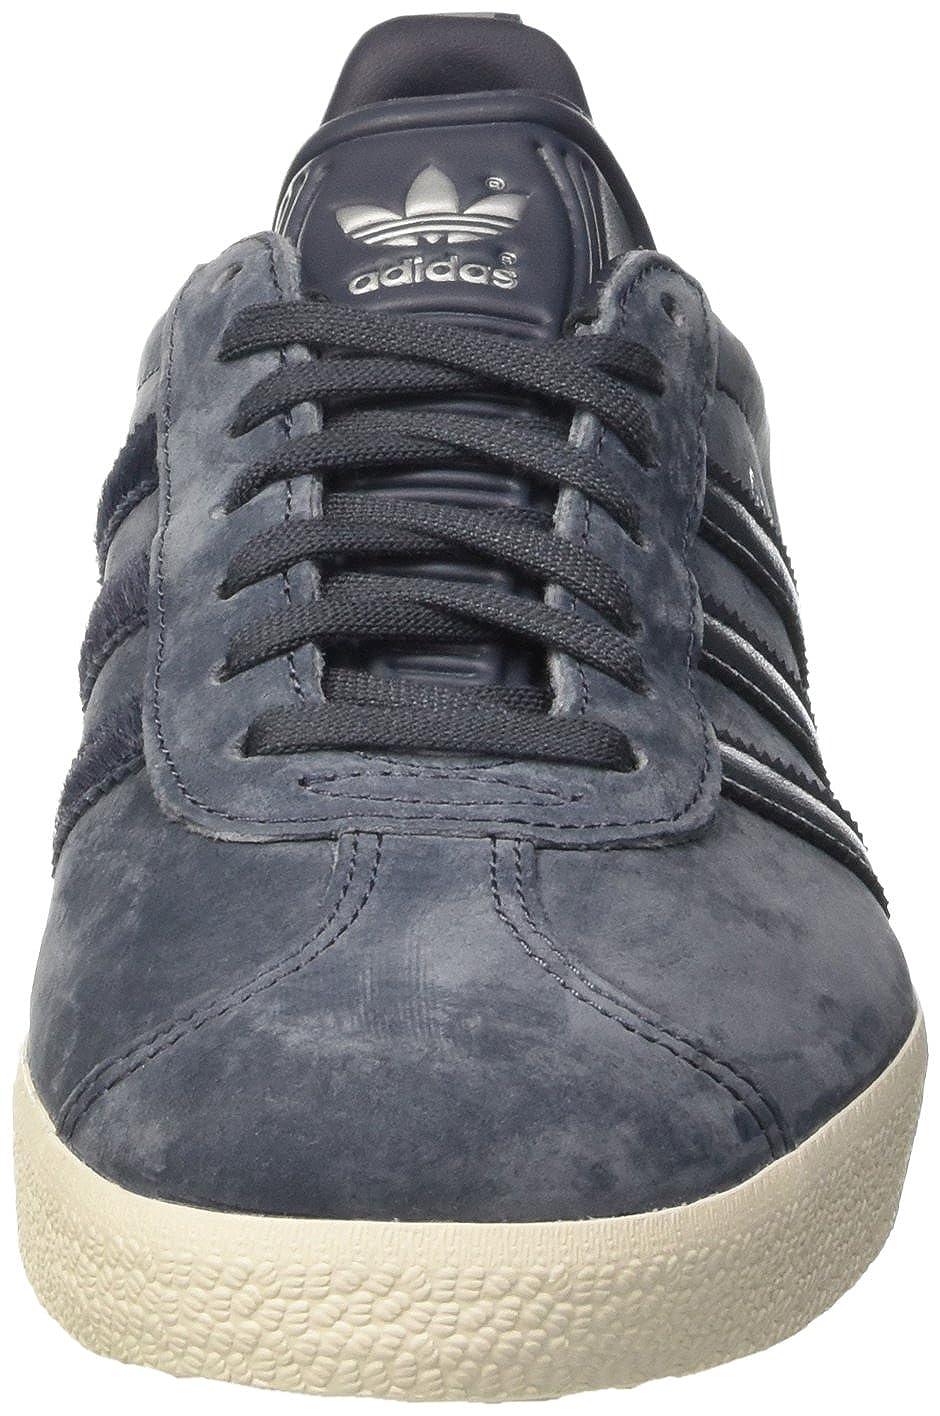 brand new 13885 e7387 adidas Damen Gazelle Pumps MainApps Amazon.de Schuhe  Handta